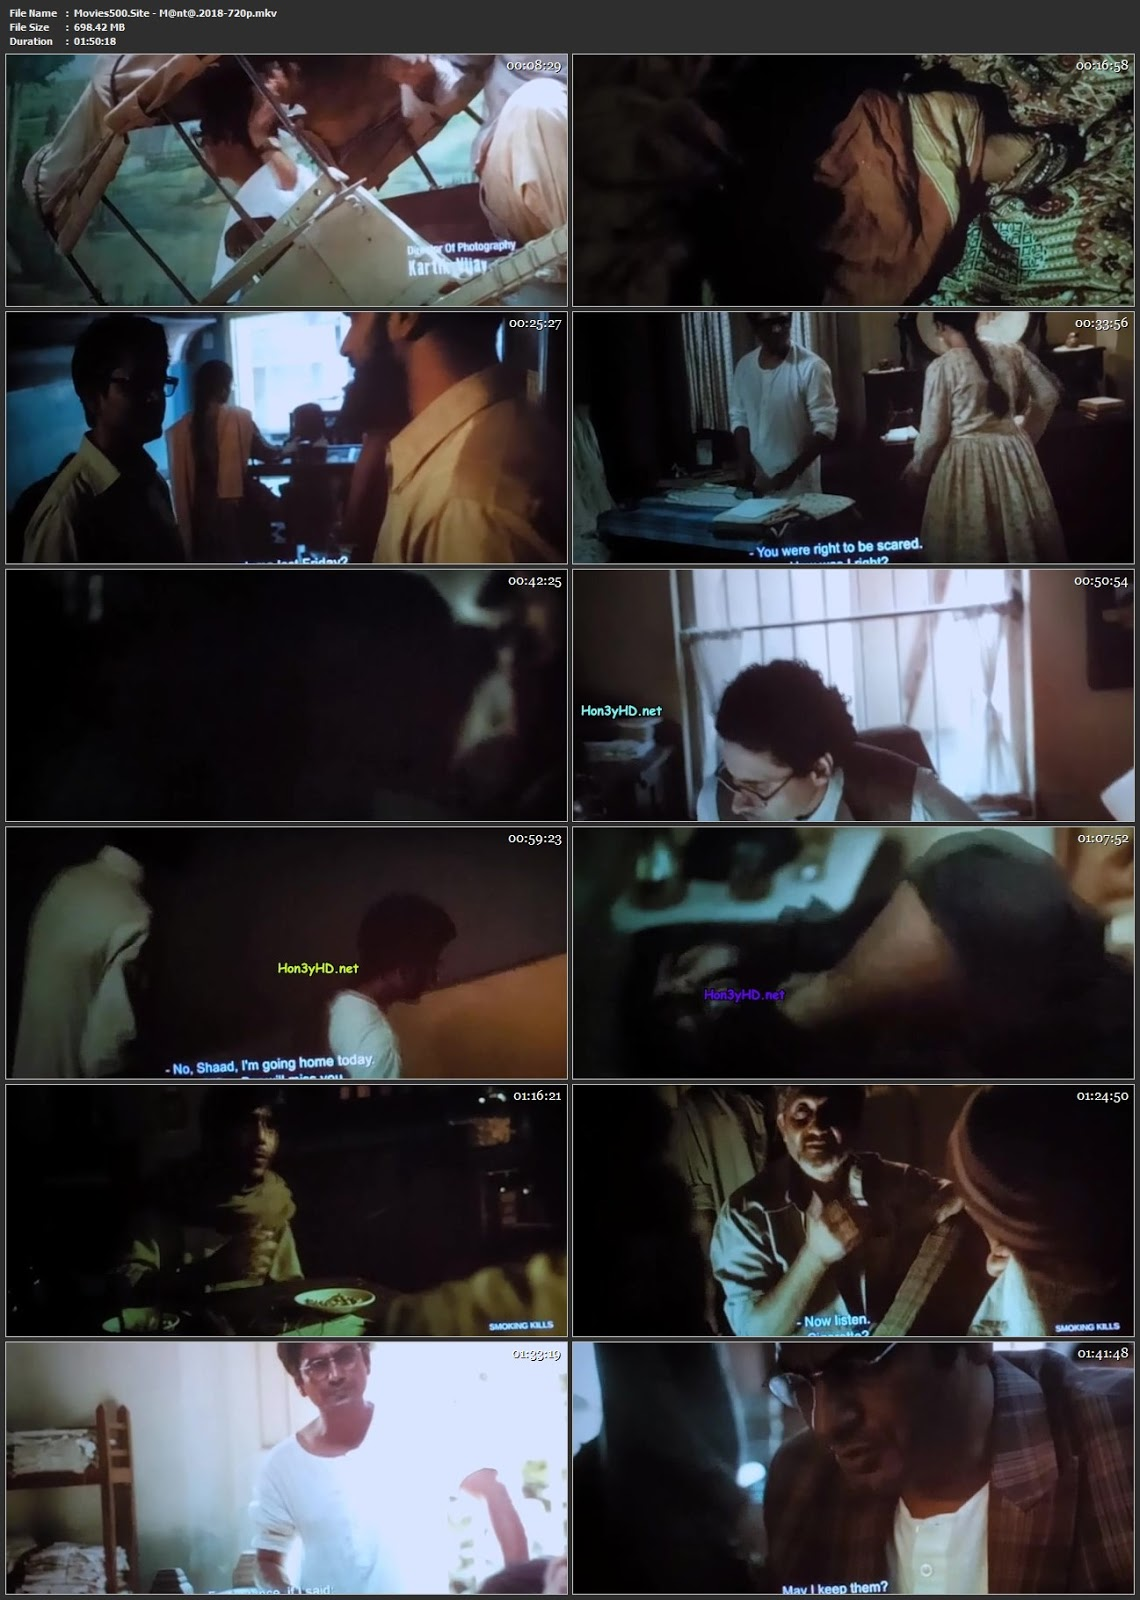 Manto 2018 Hindi Movie X64 HDCAM 720p